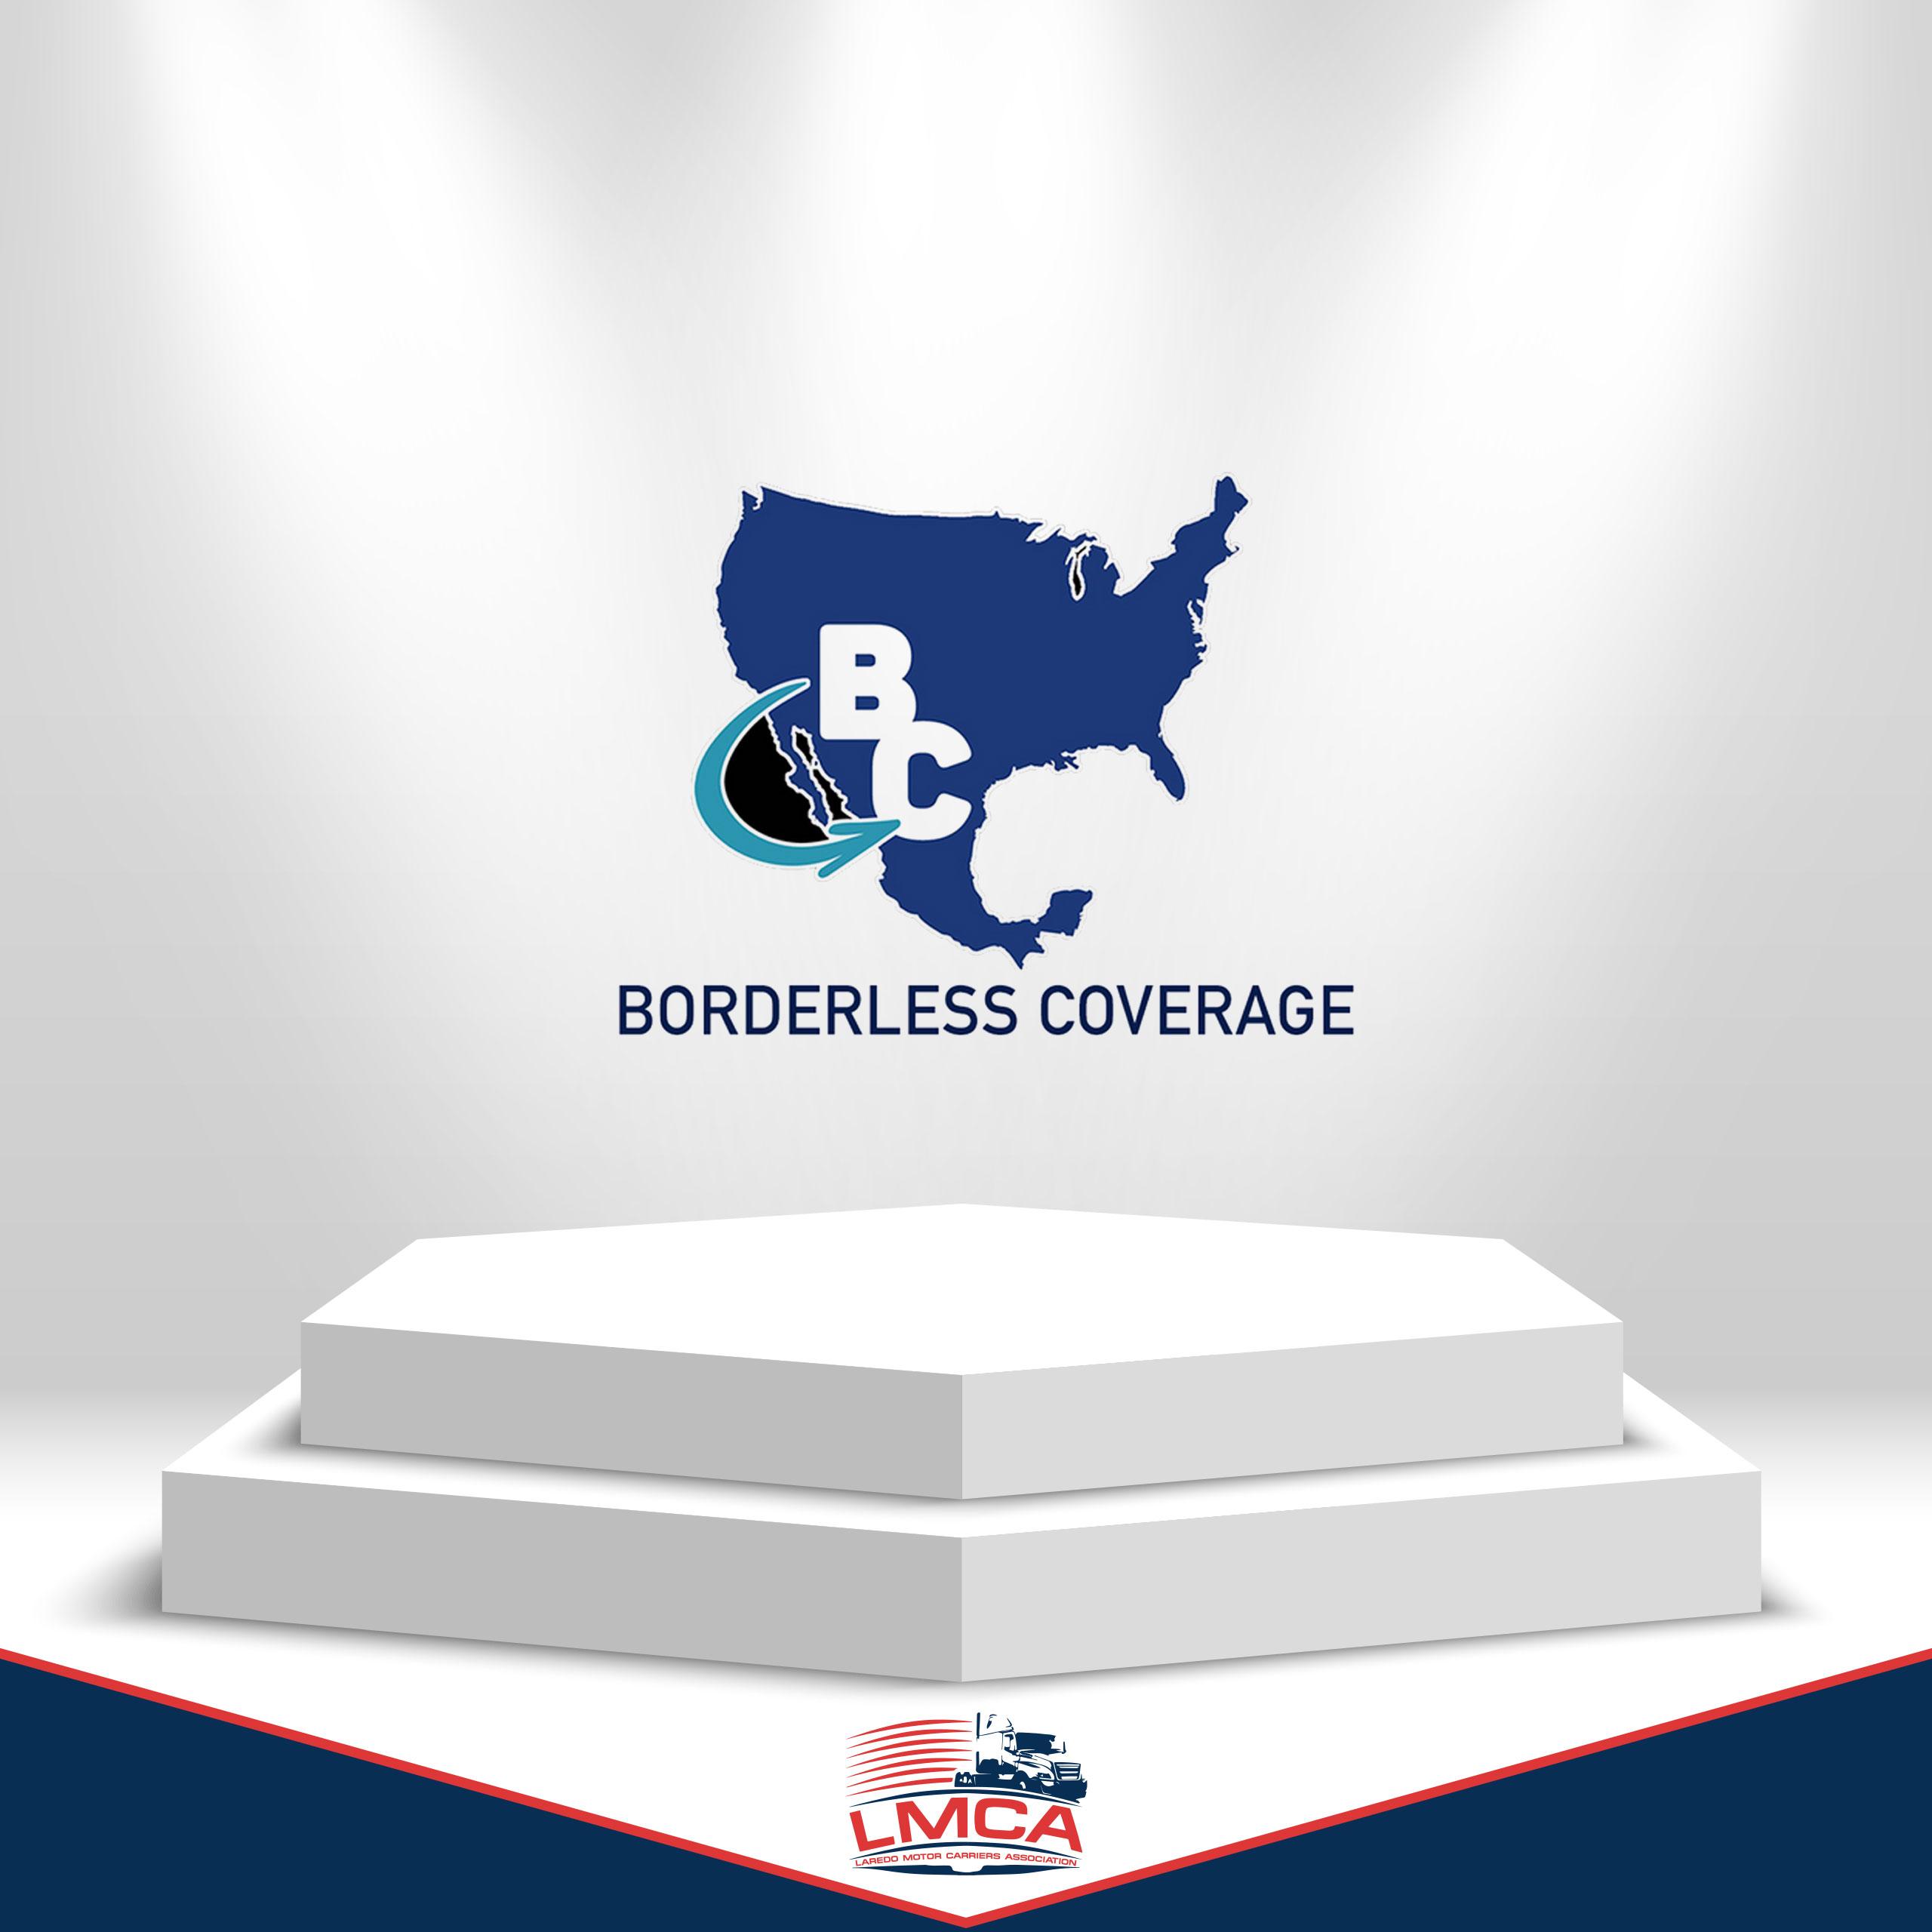 Borderless coverage